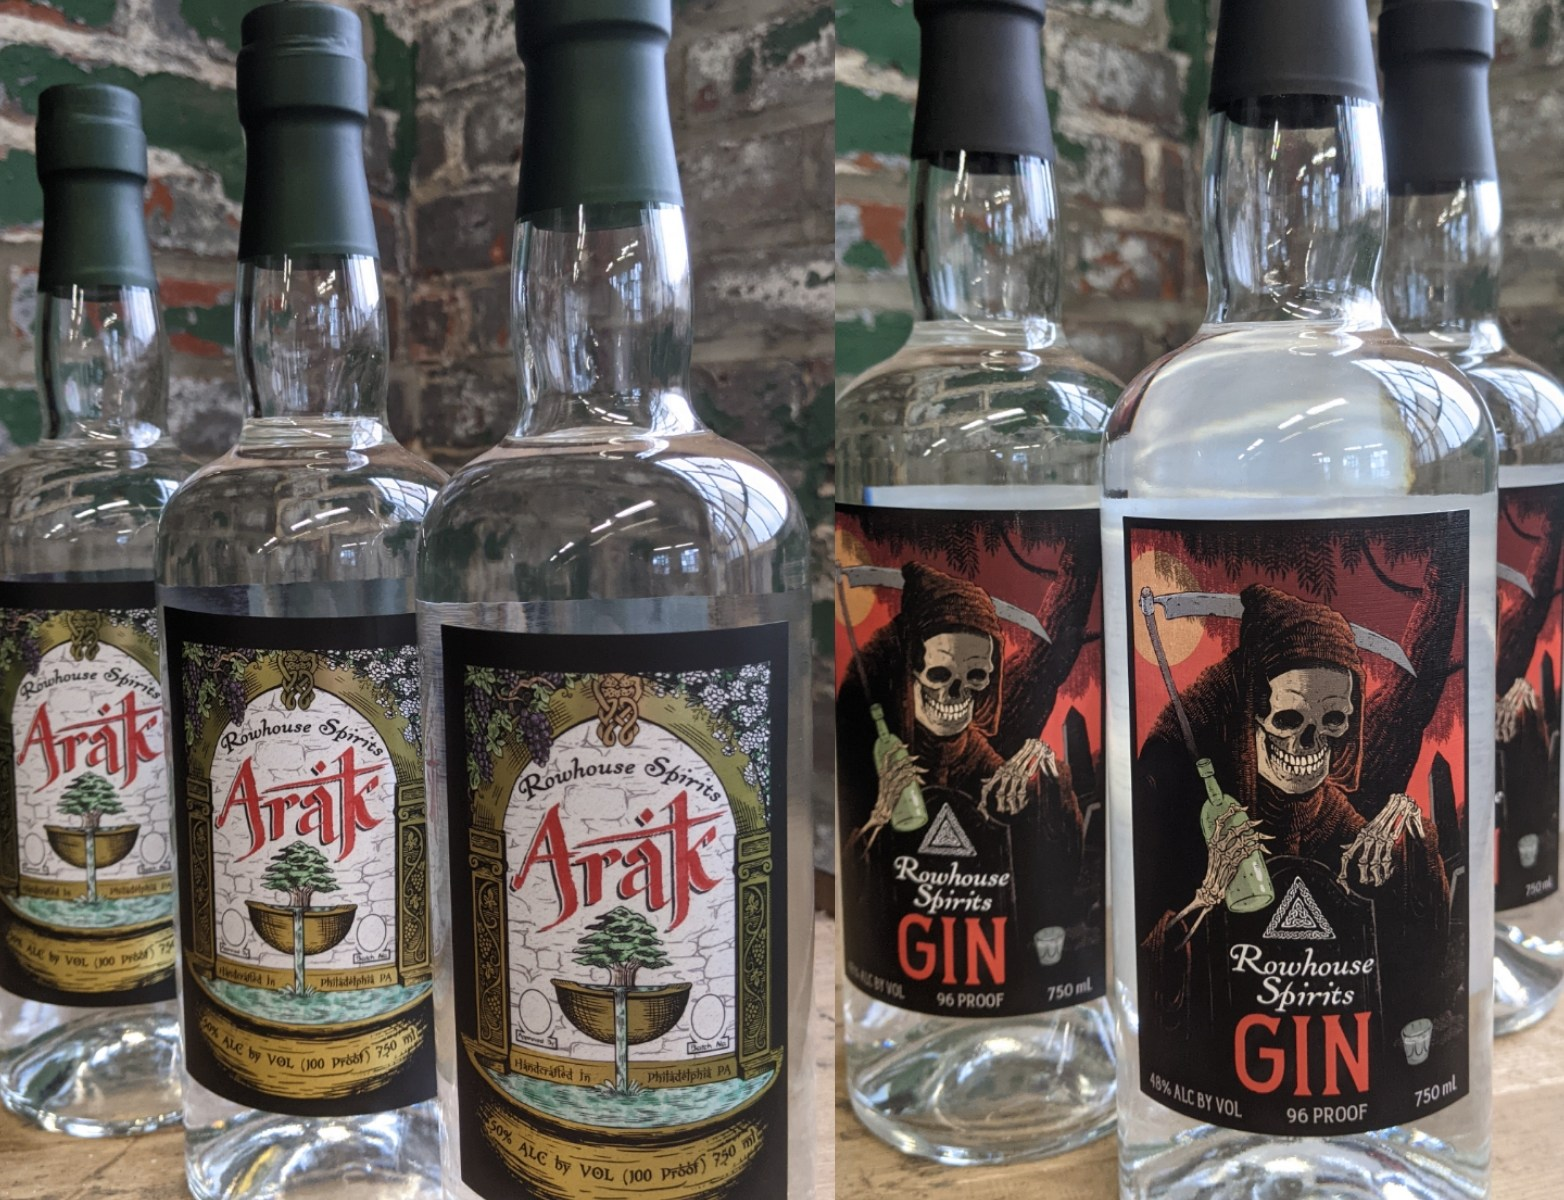 Rowhouse Spirits Arak and Gin